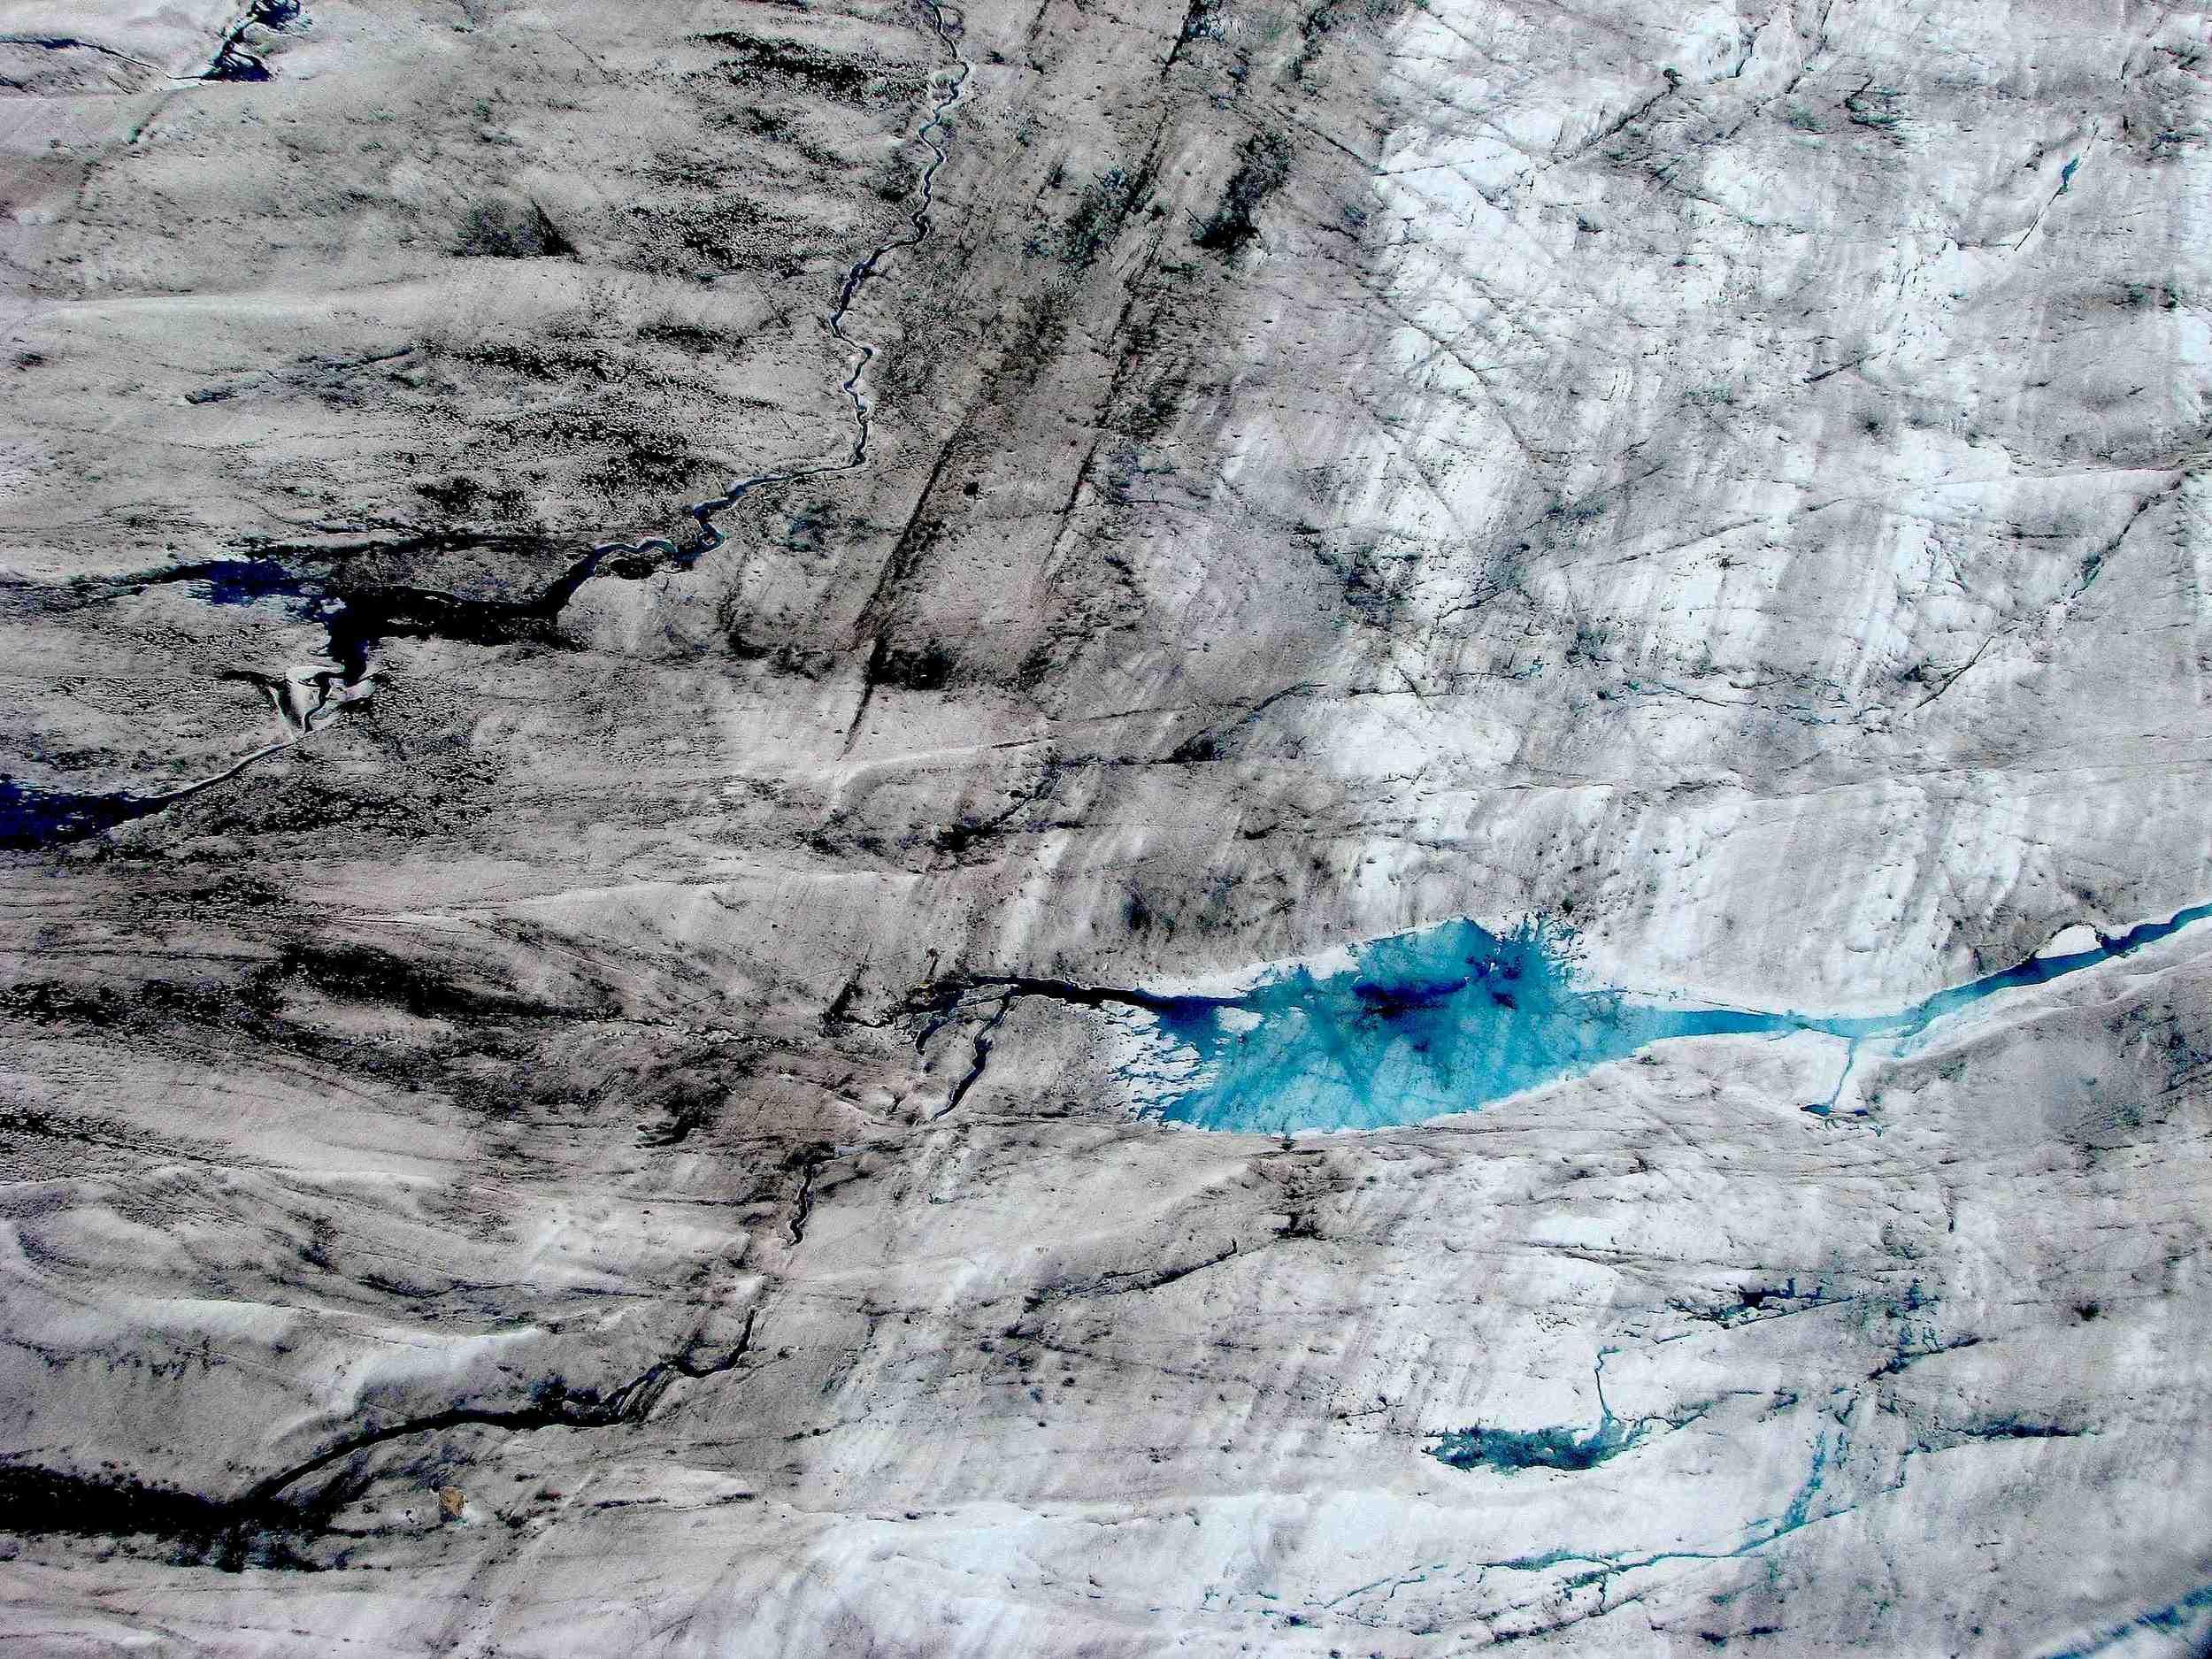 Patterson glacier, near Petersburg, Alaska, from the air. Photo: Laura Ivill